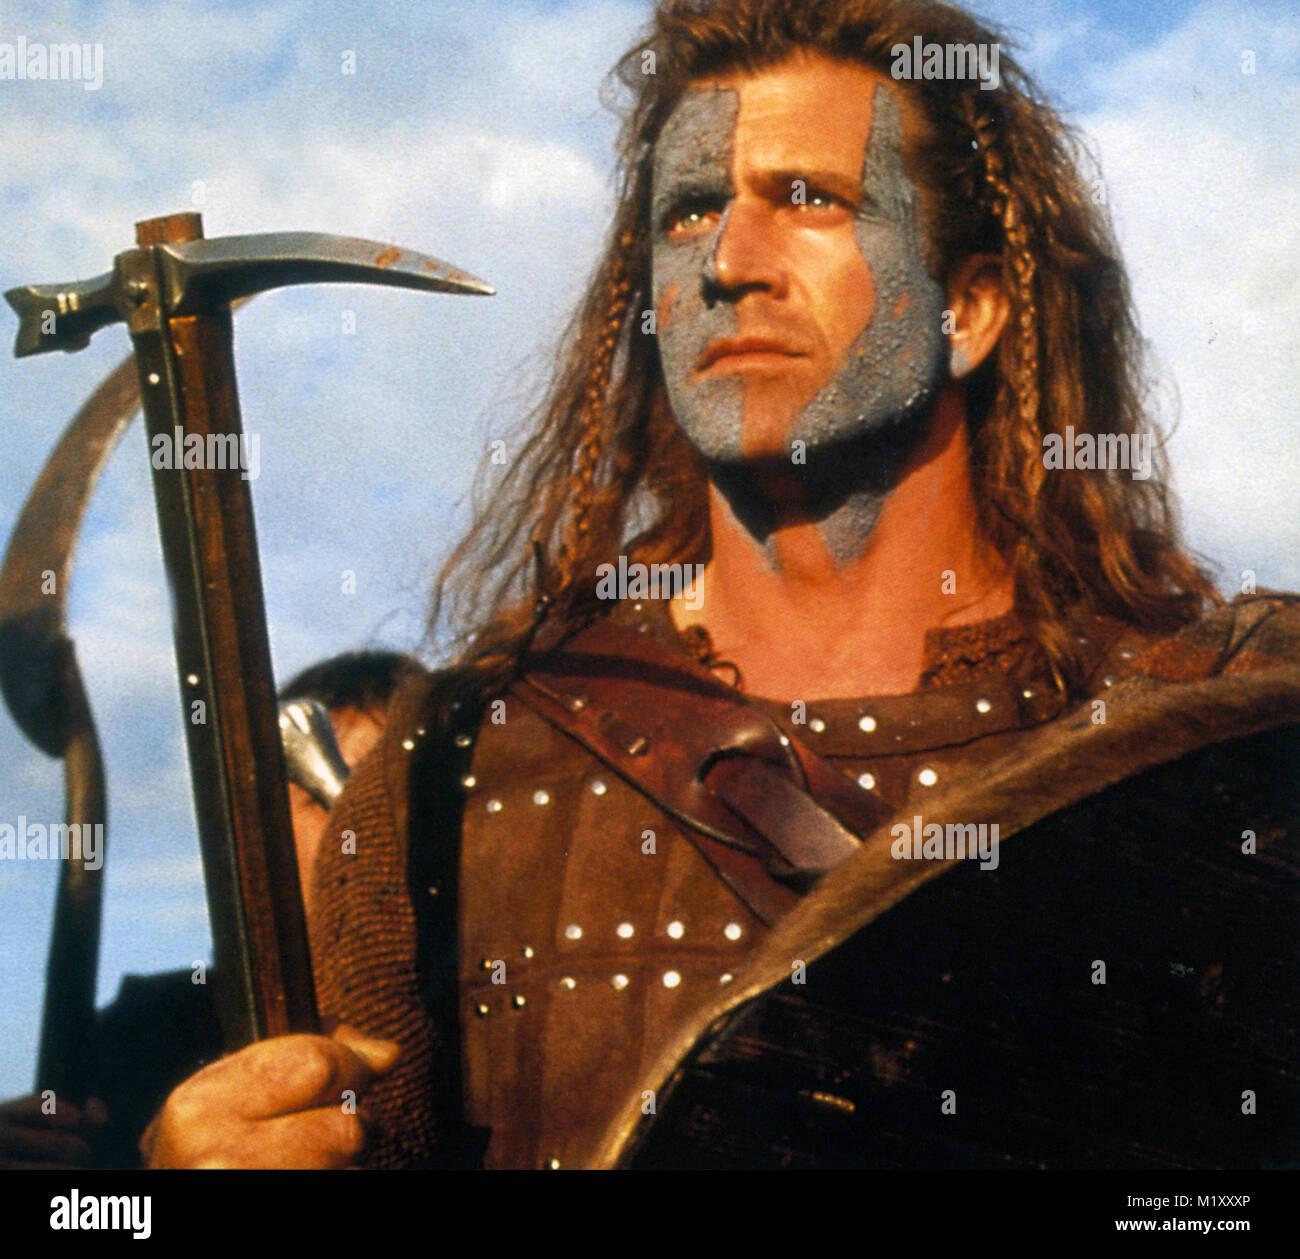 BRAVEHEART 1995 Icon Entertainment film with Mel Gibson - Stock Image